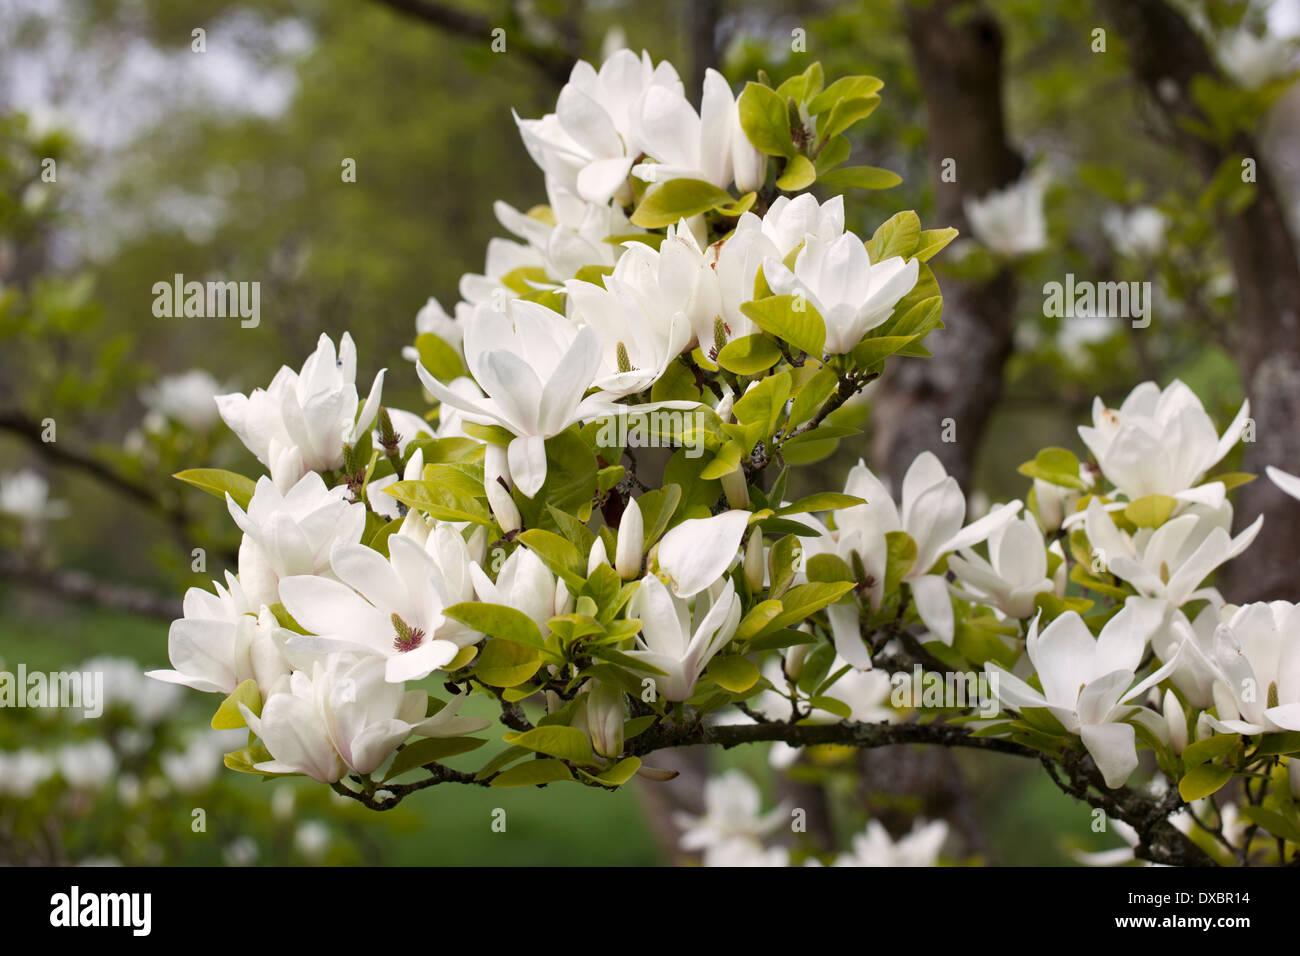 Branch of a white flowering magnolia tree stock photo 67871696 alamy branch of a white flowering magnolia tree mightylinksfo